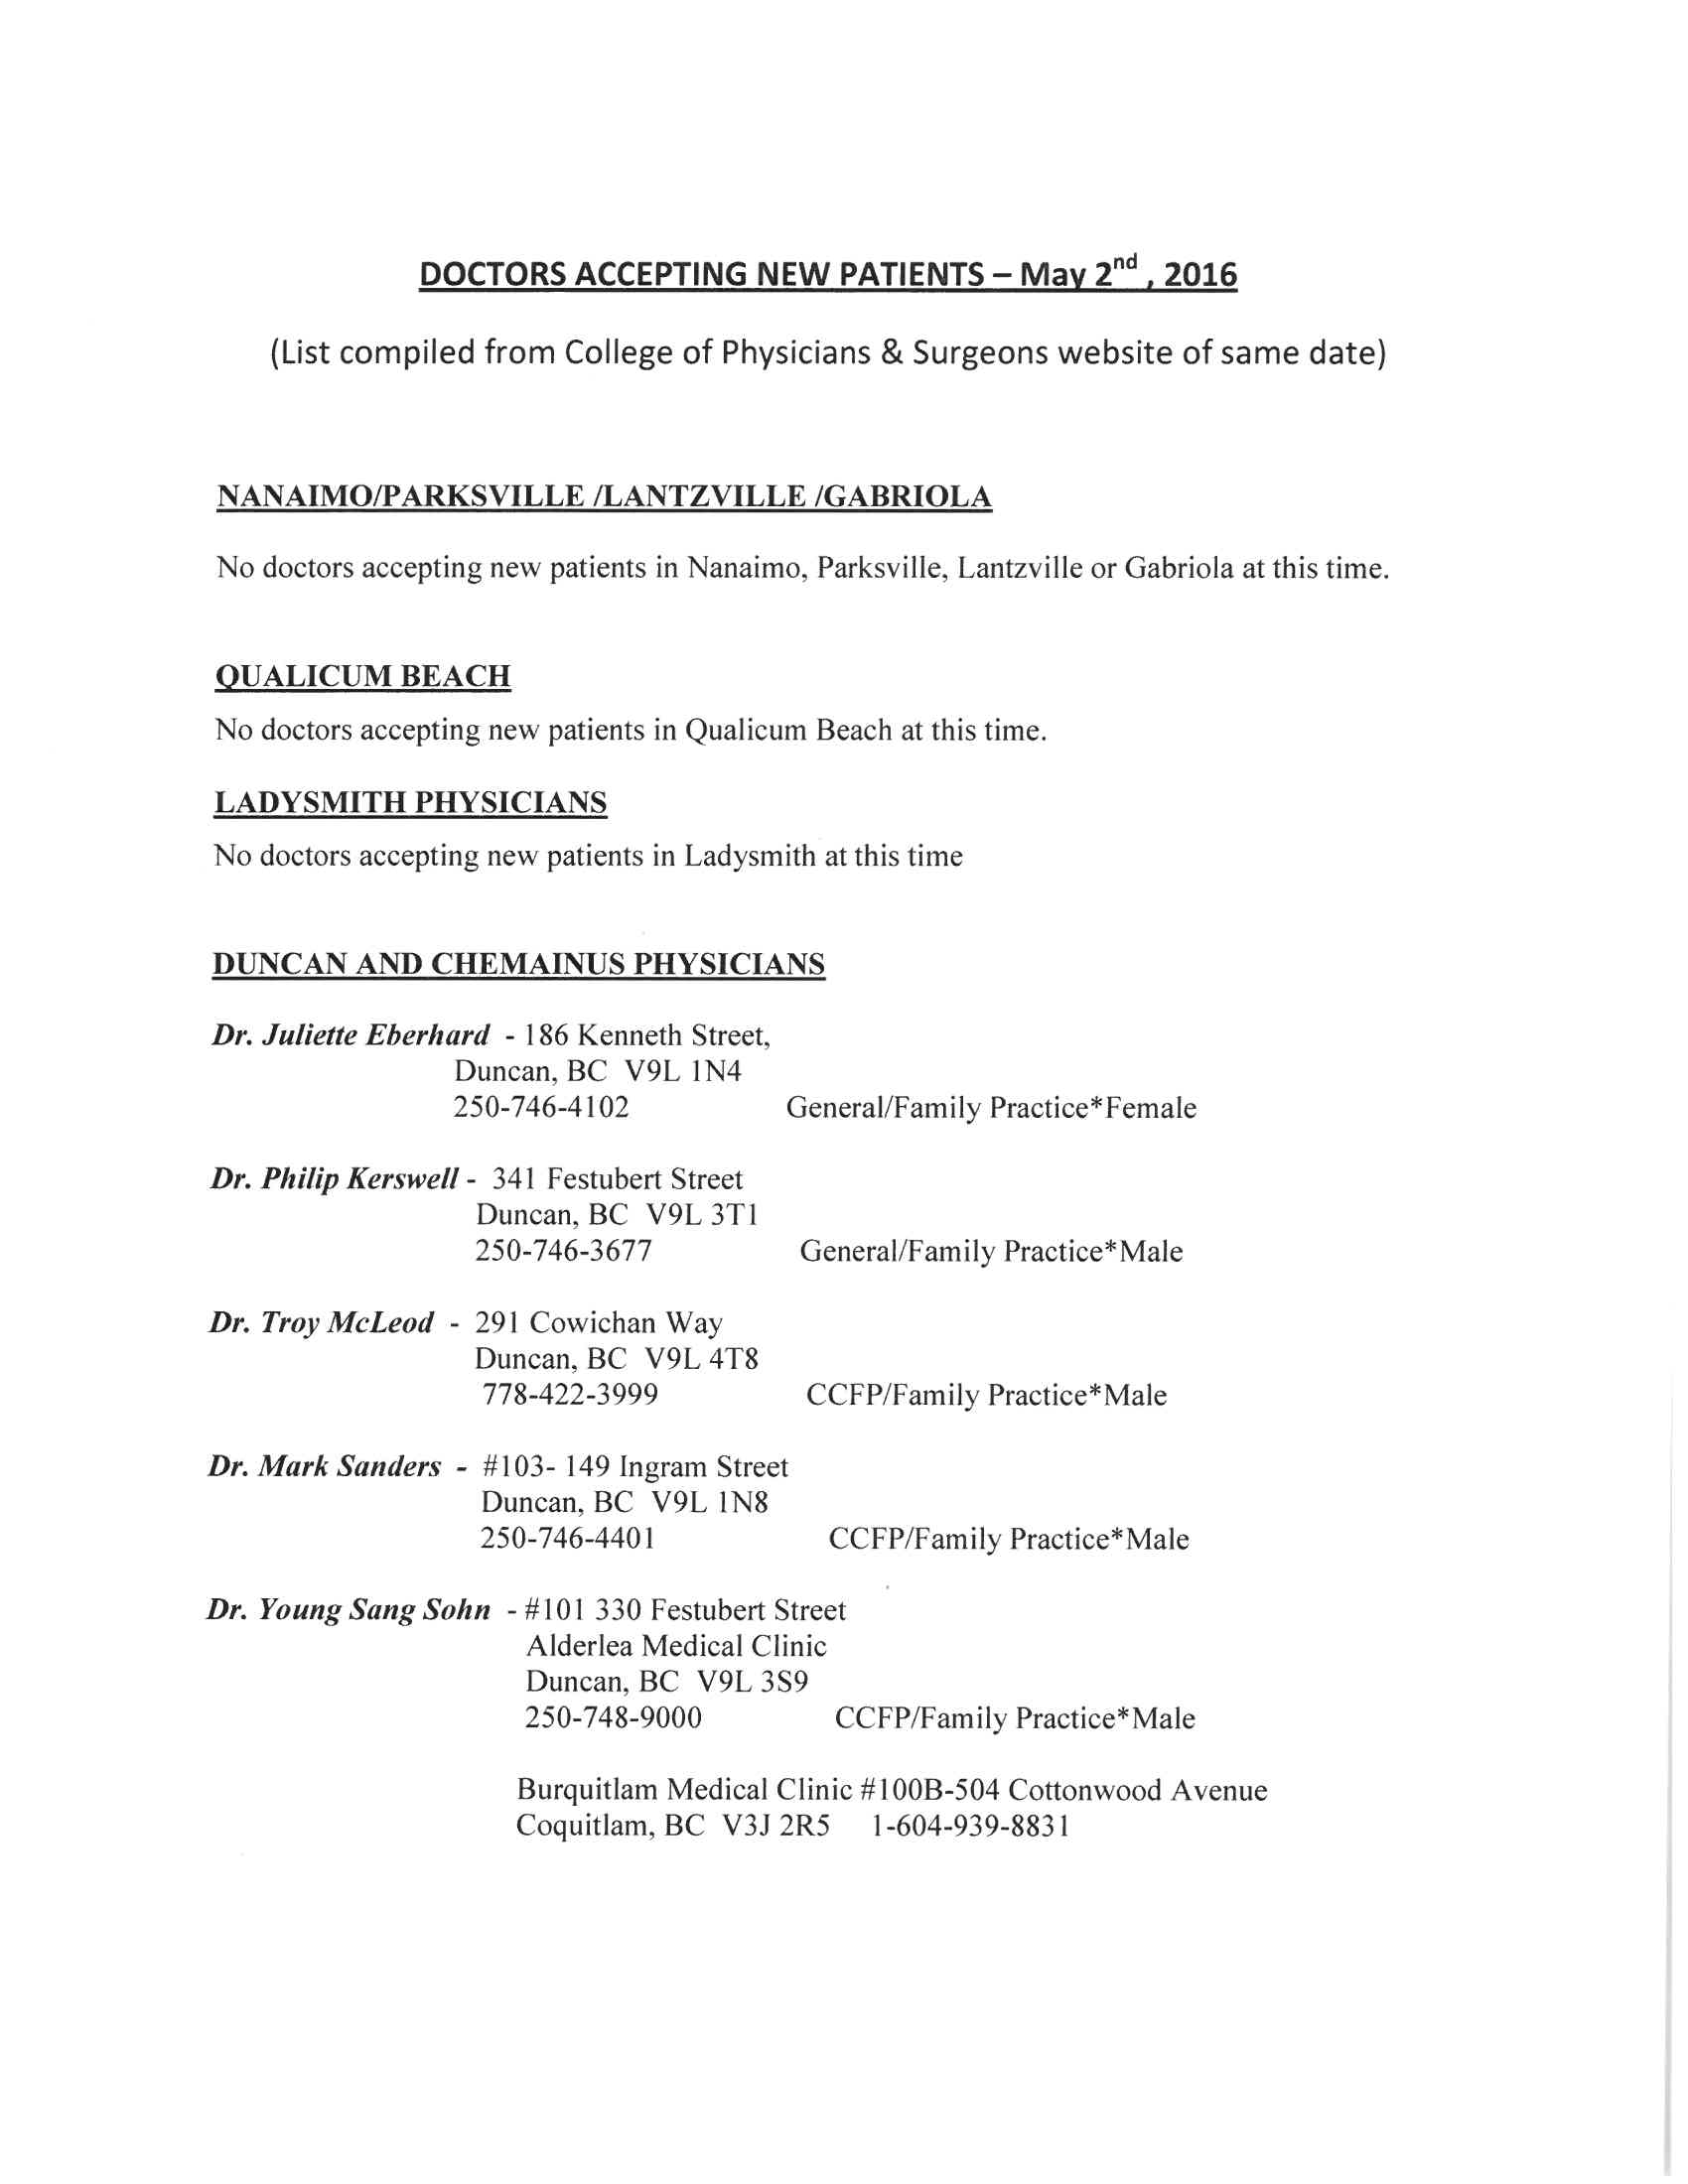 TFN Bulletin June 1-2016 Part 2_Page_08.jpg